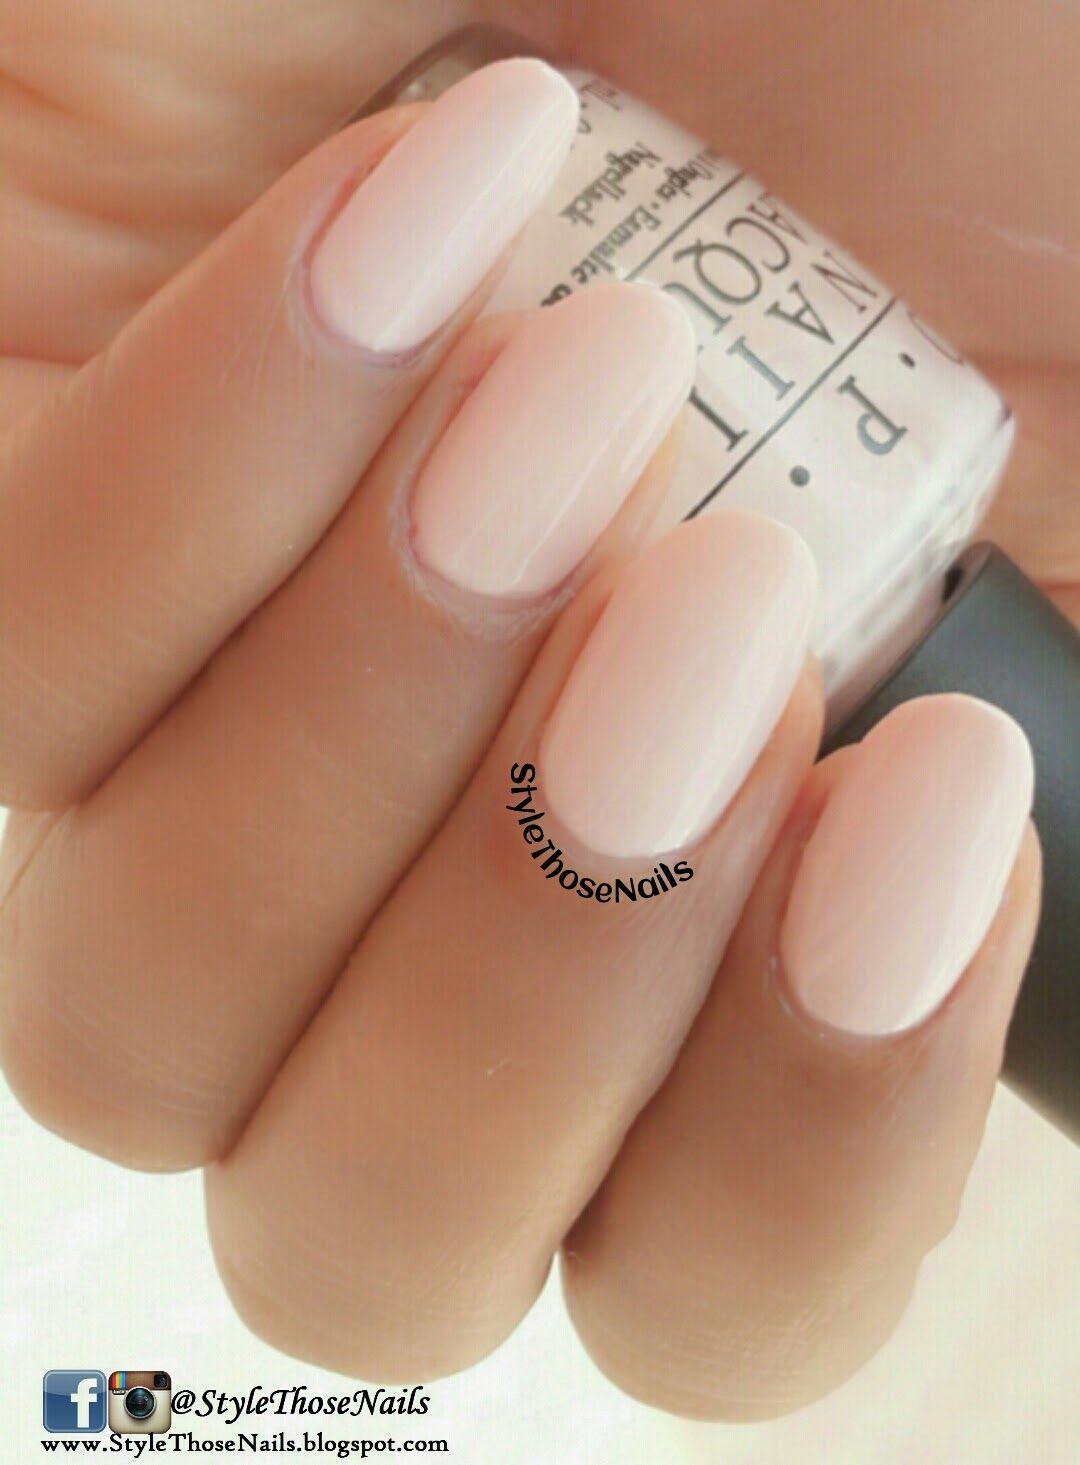 The best images about nägel on pinterest nail art